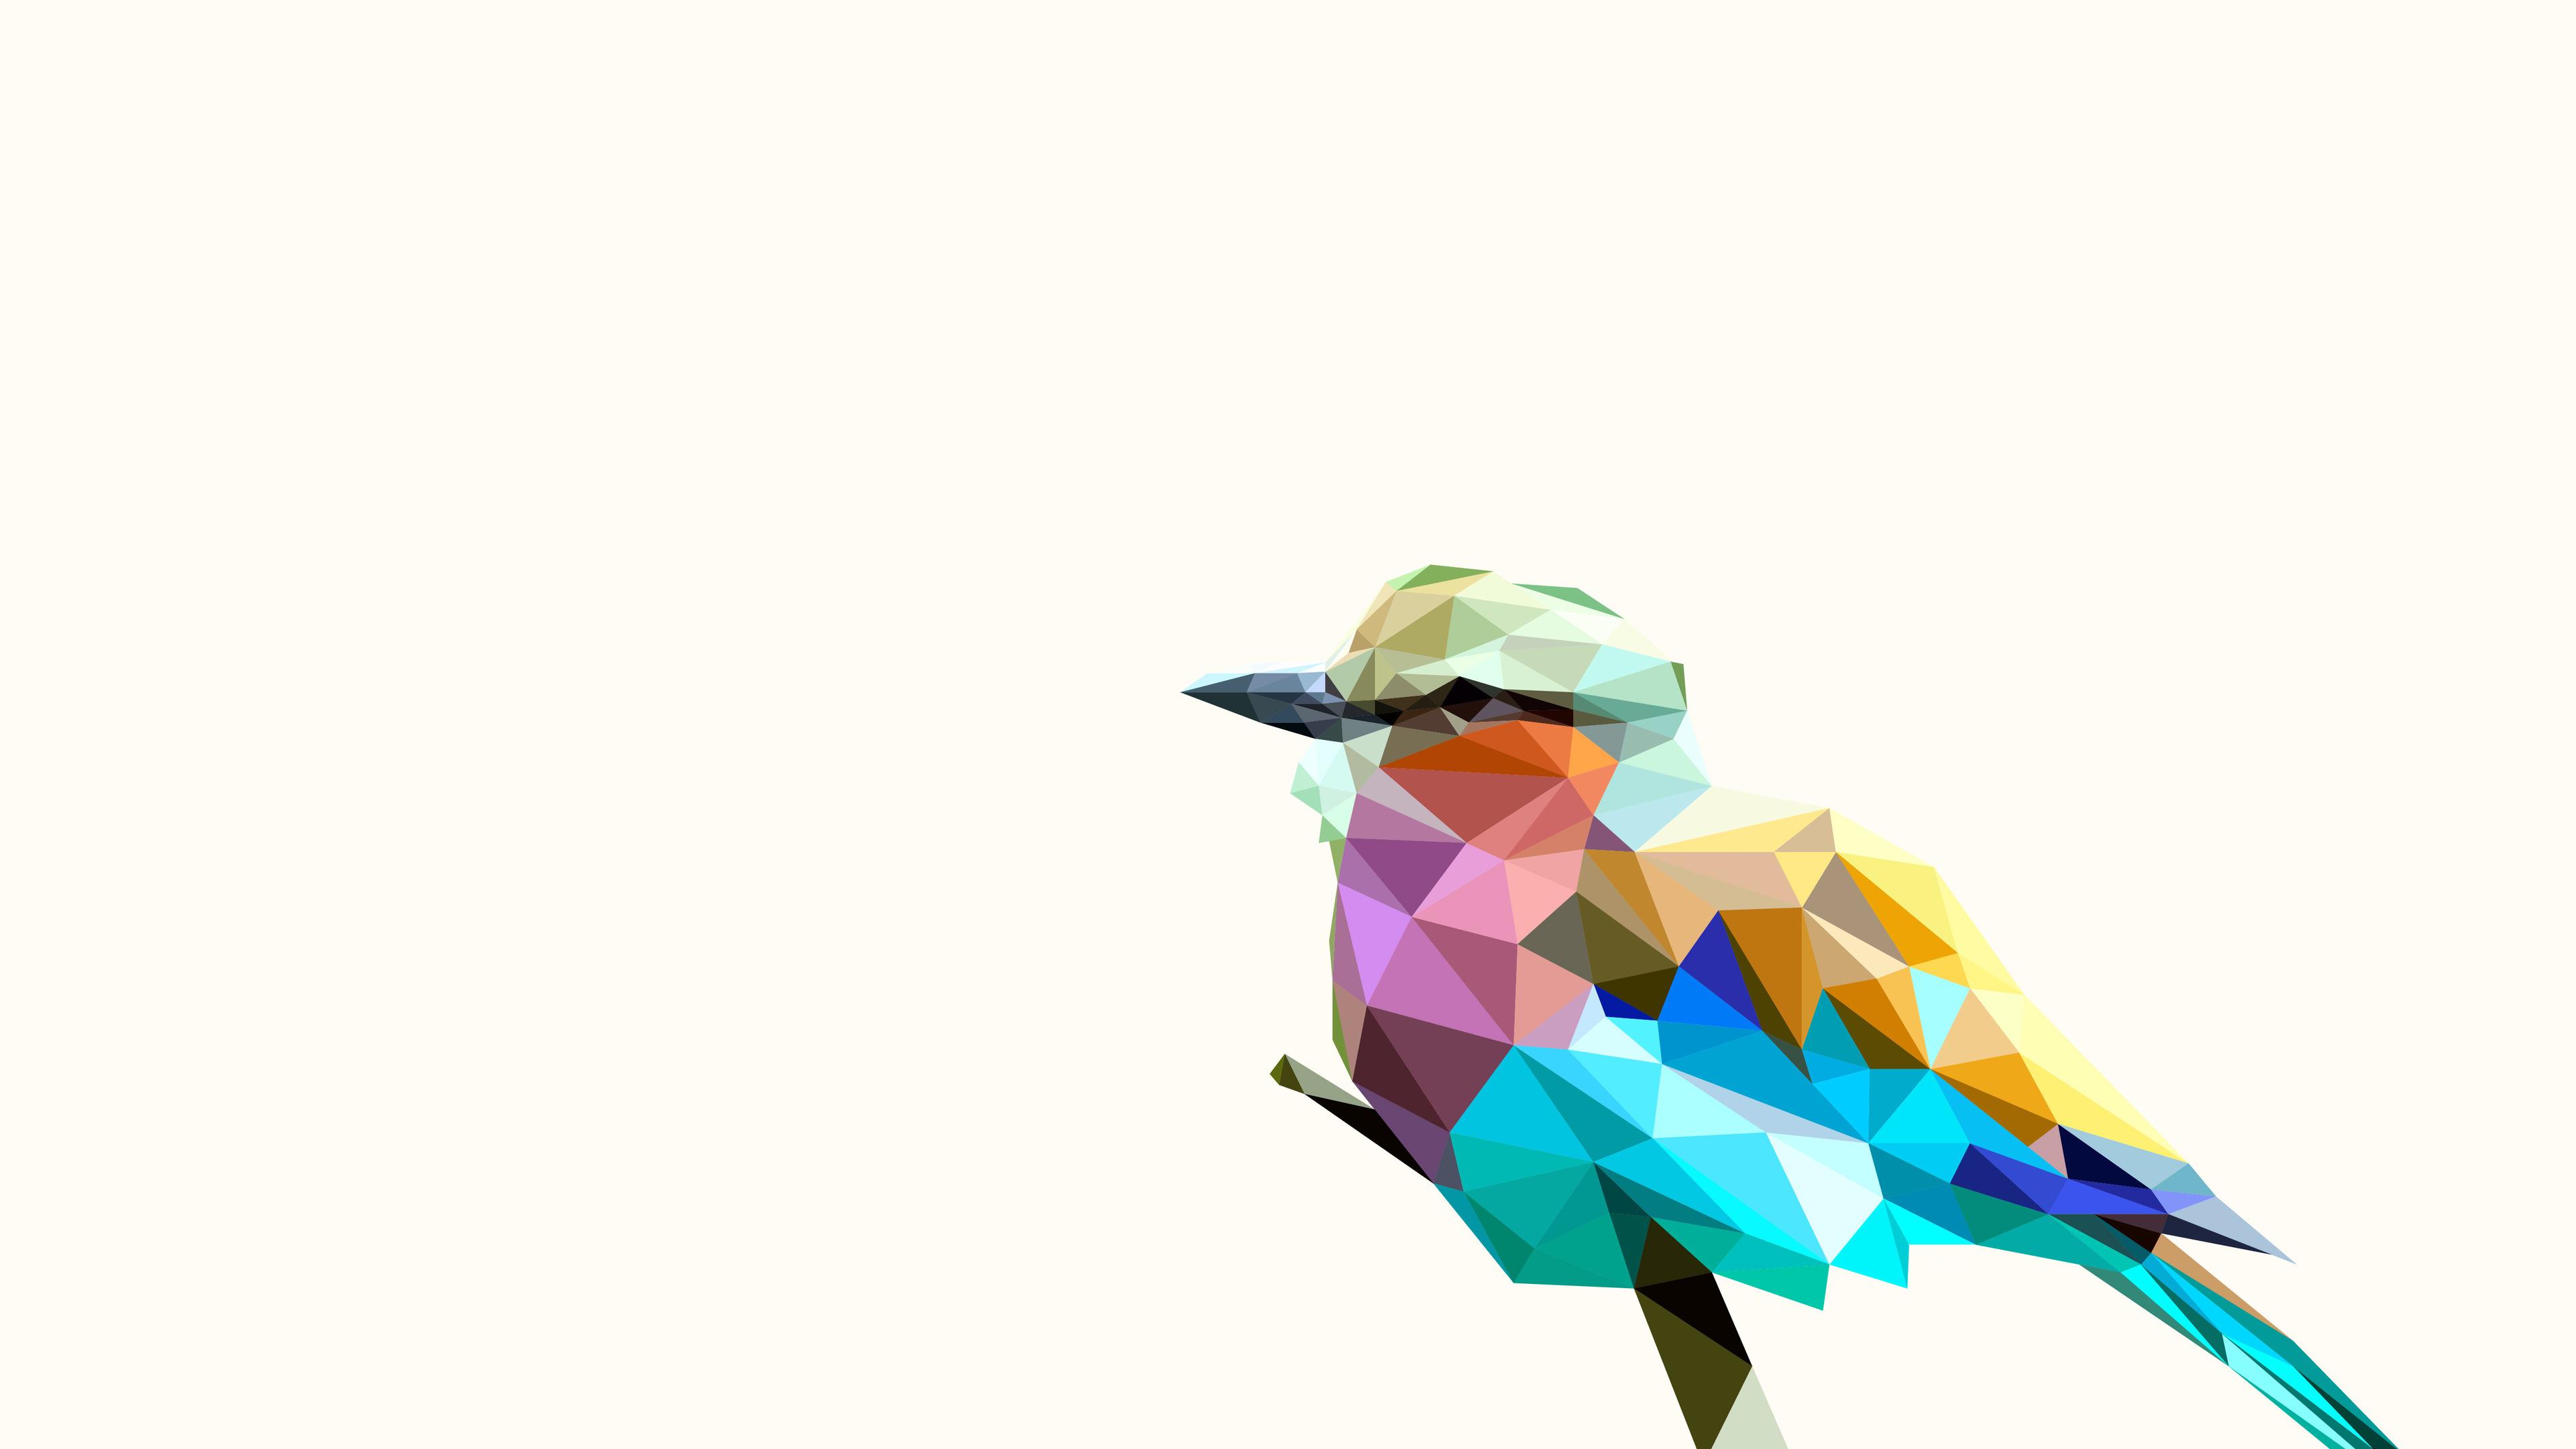 bird rainbow polyart 4k 1540751387 - Bird Rainbow Polyart 4k - rainbow wallpapers, polyart wallpapers, hd-wallpapers, digital art wallpapers, bird wallpapers, artist wallpapers, 5k wallpapers, 4k-wallpapers